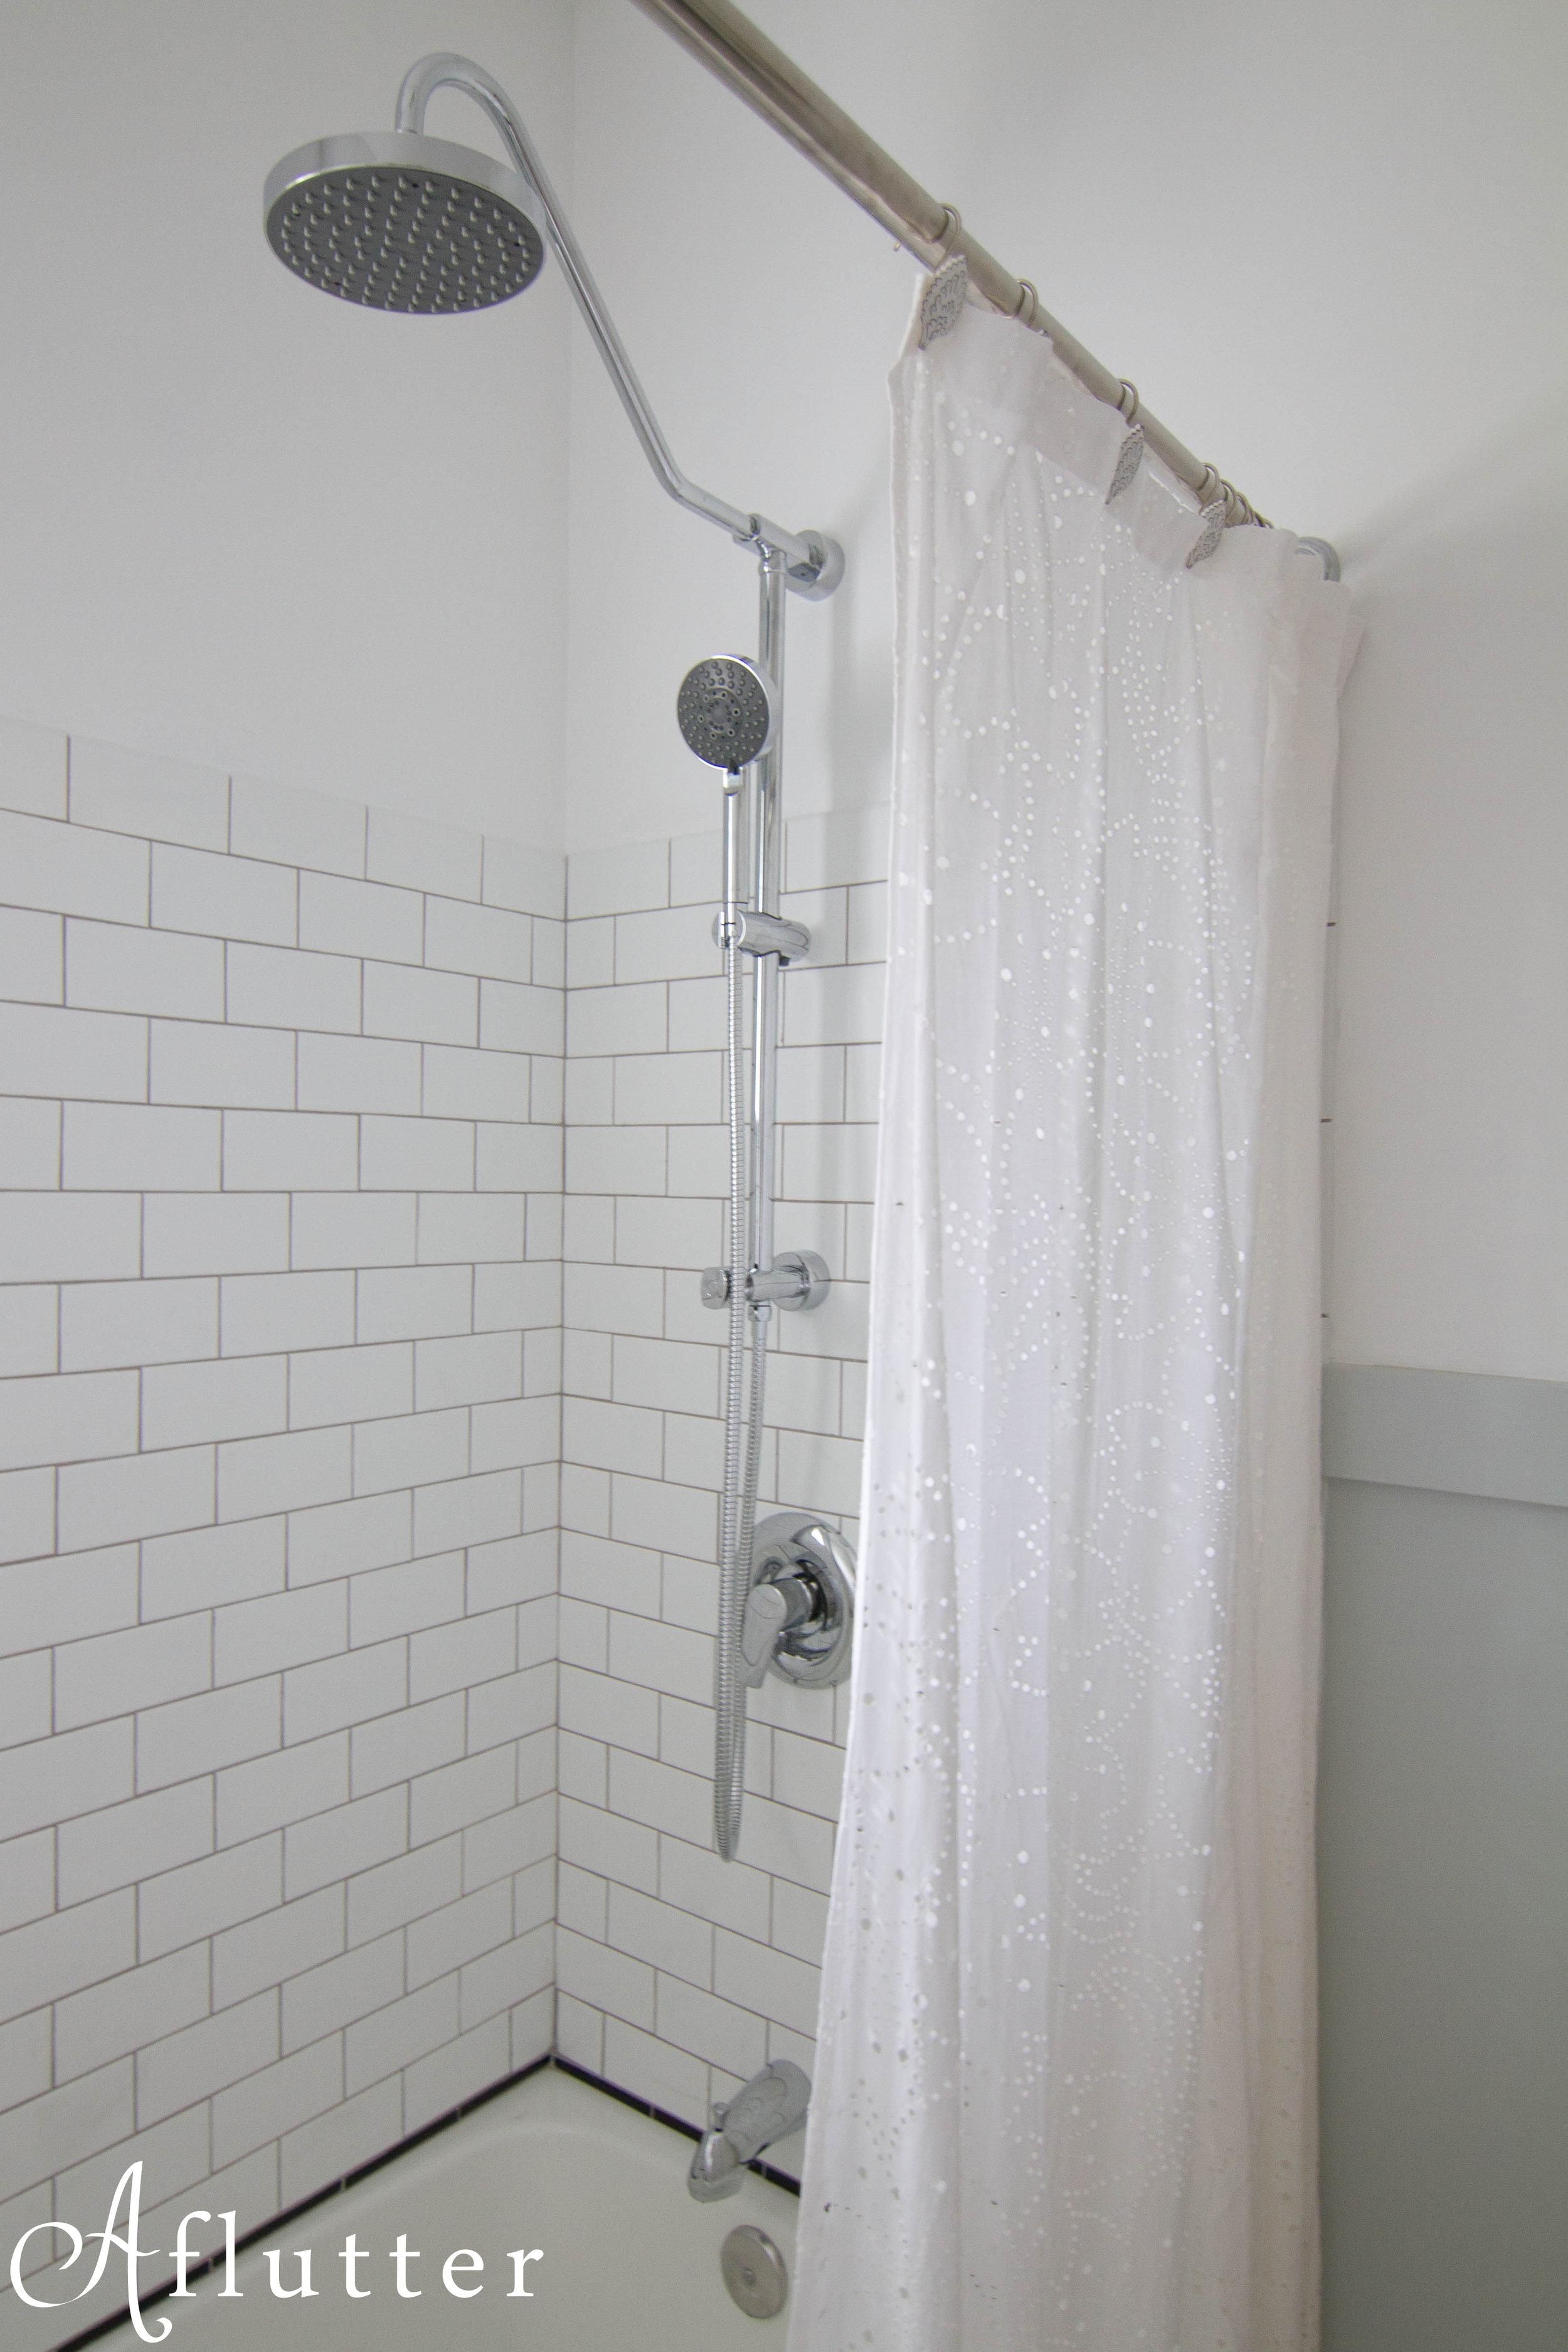 Bath-Remodel-8-of-11.jpg